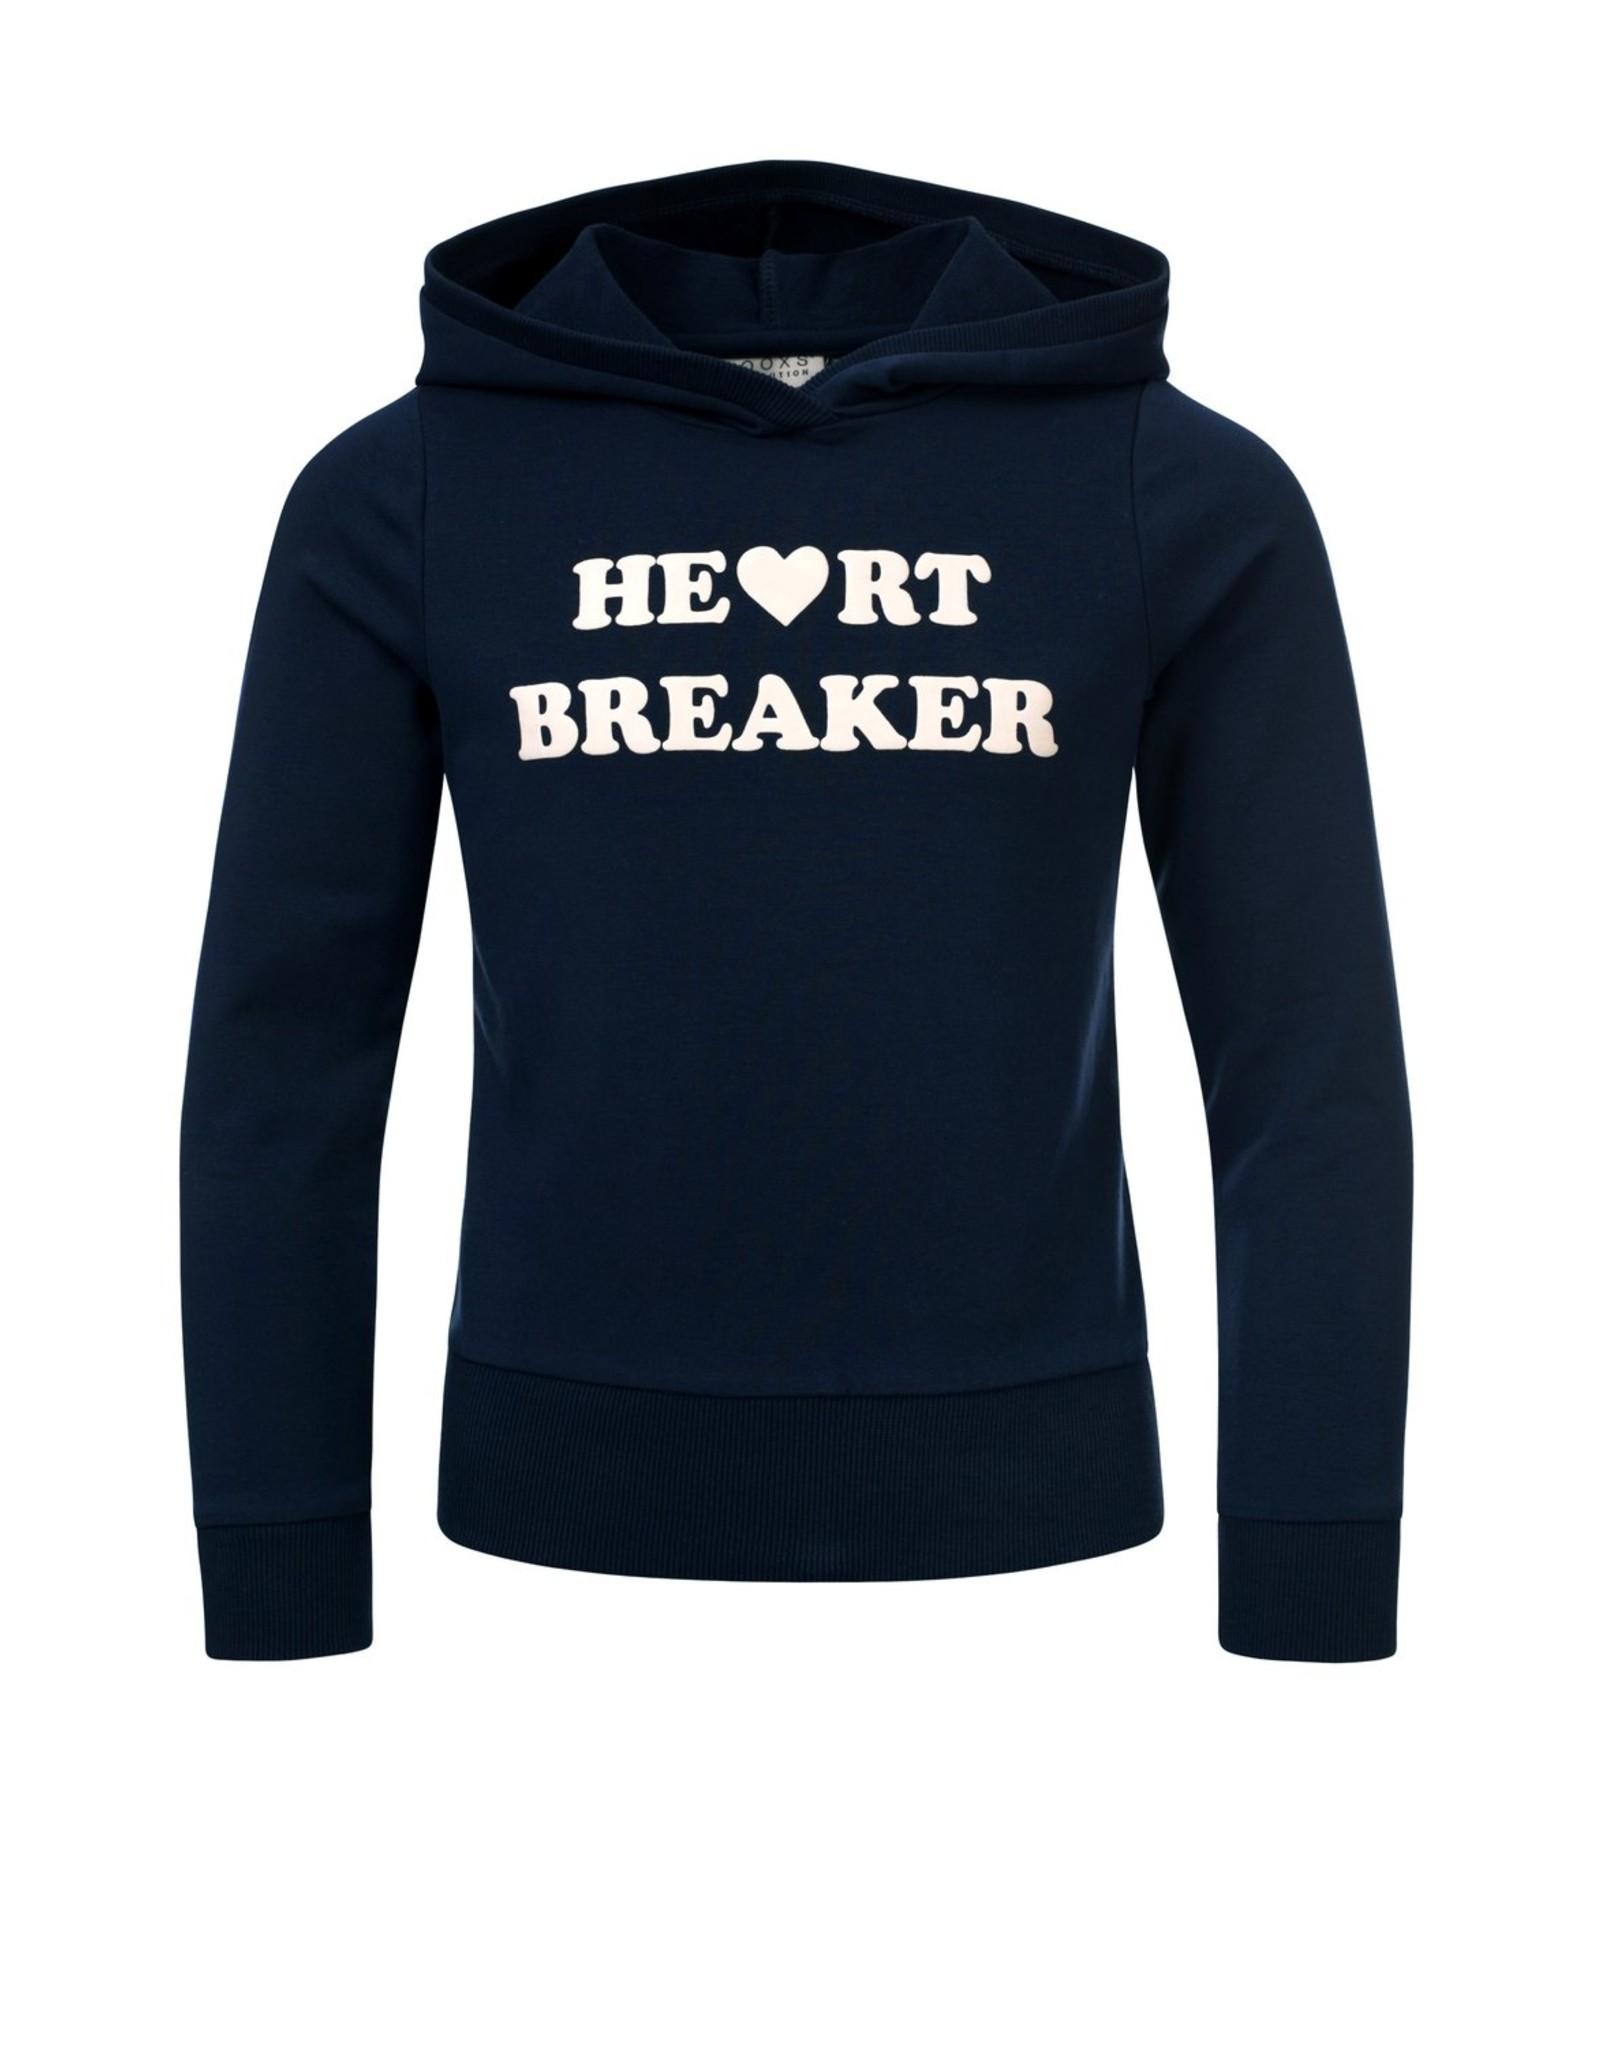 Looxs 10SIXTEEN Girls Hoody sweater m